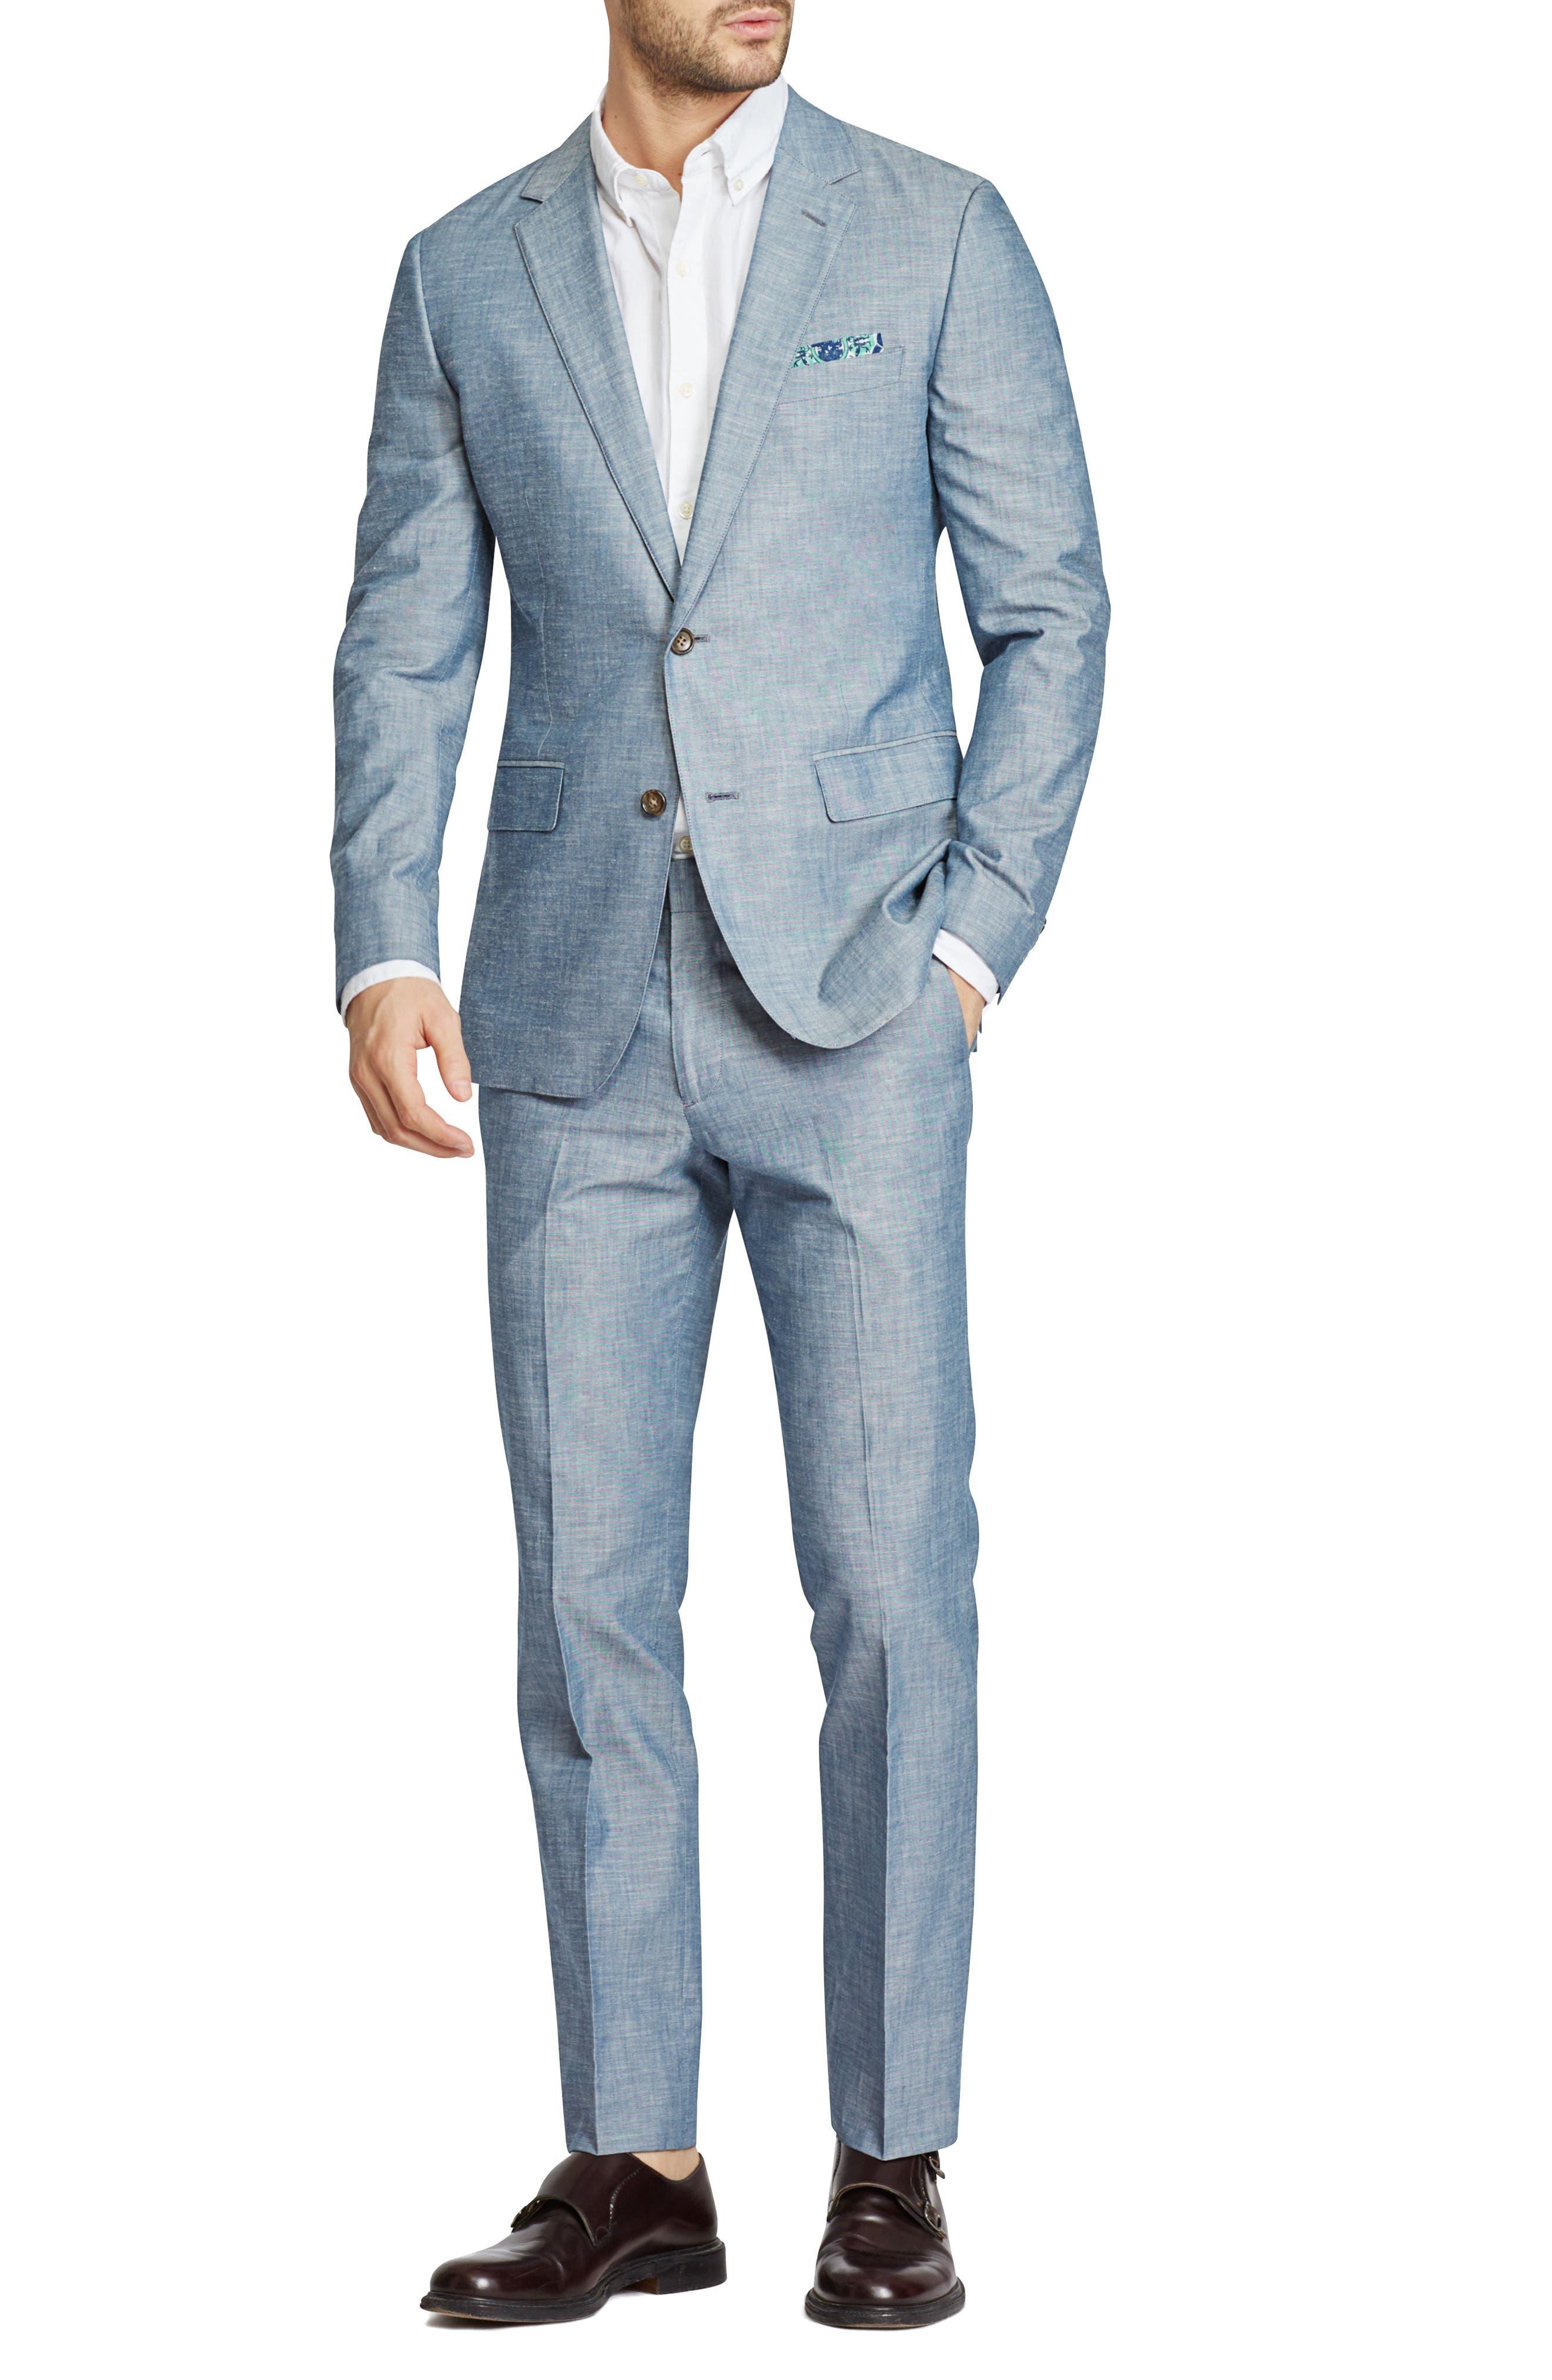 BONOBOS, Slim Fit Chambray Cotton Blazer, Main thumbnail 1, color, SOLID BLUE